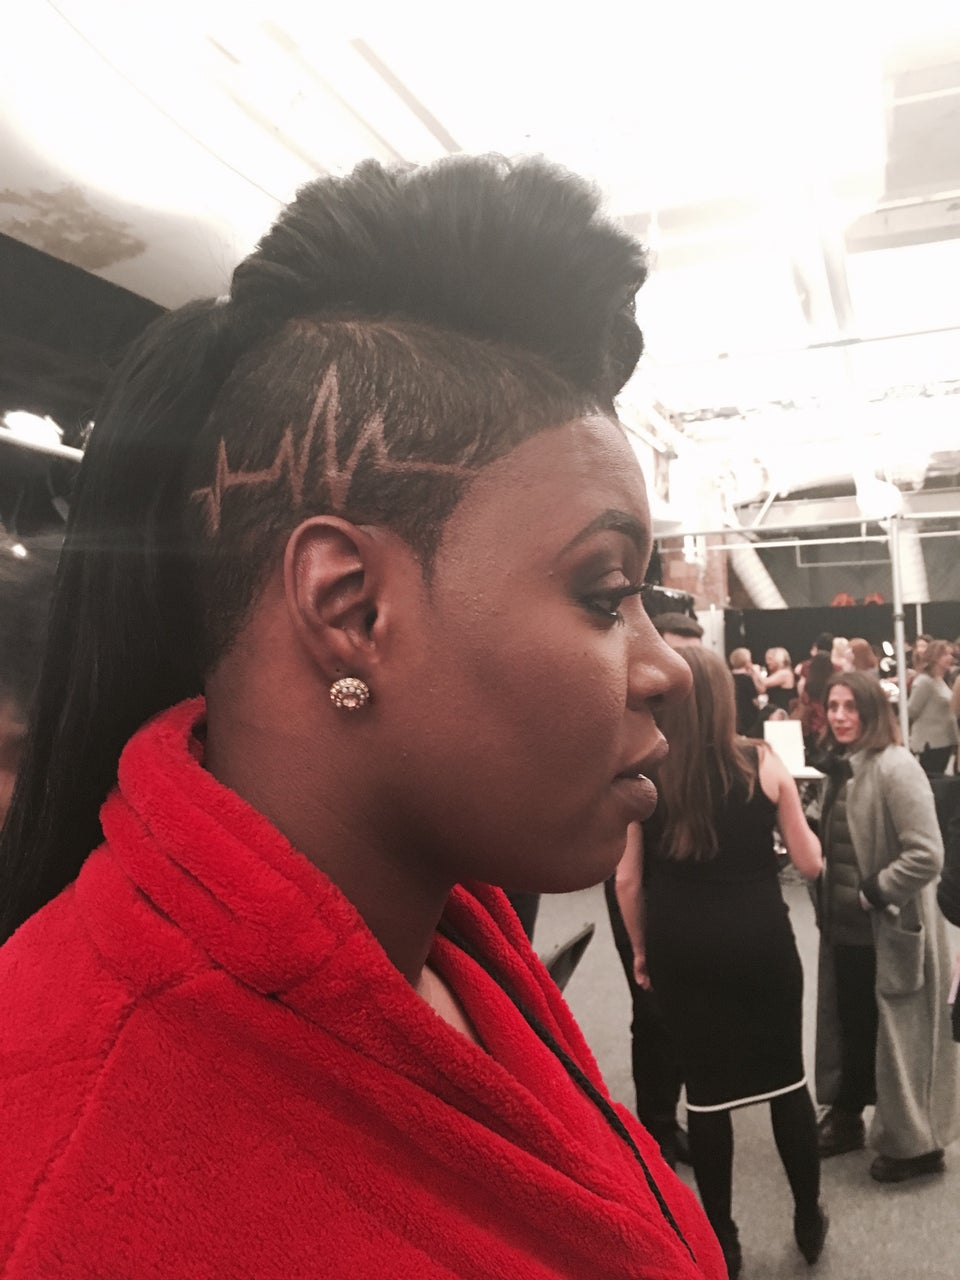 'Empire's' Ta'Rhonda Jones Wears Shaved Heartbeat on Head For Go Red for Women Dress Show